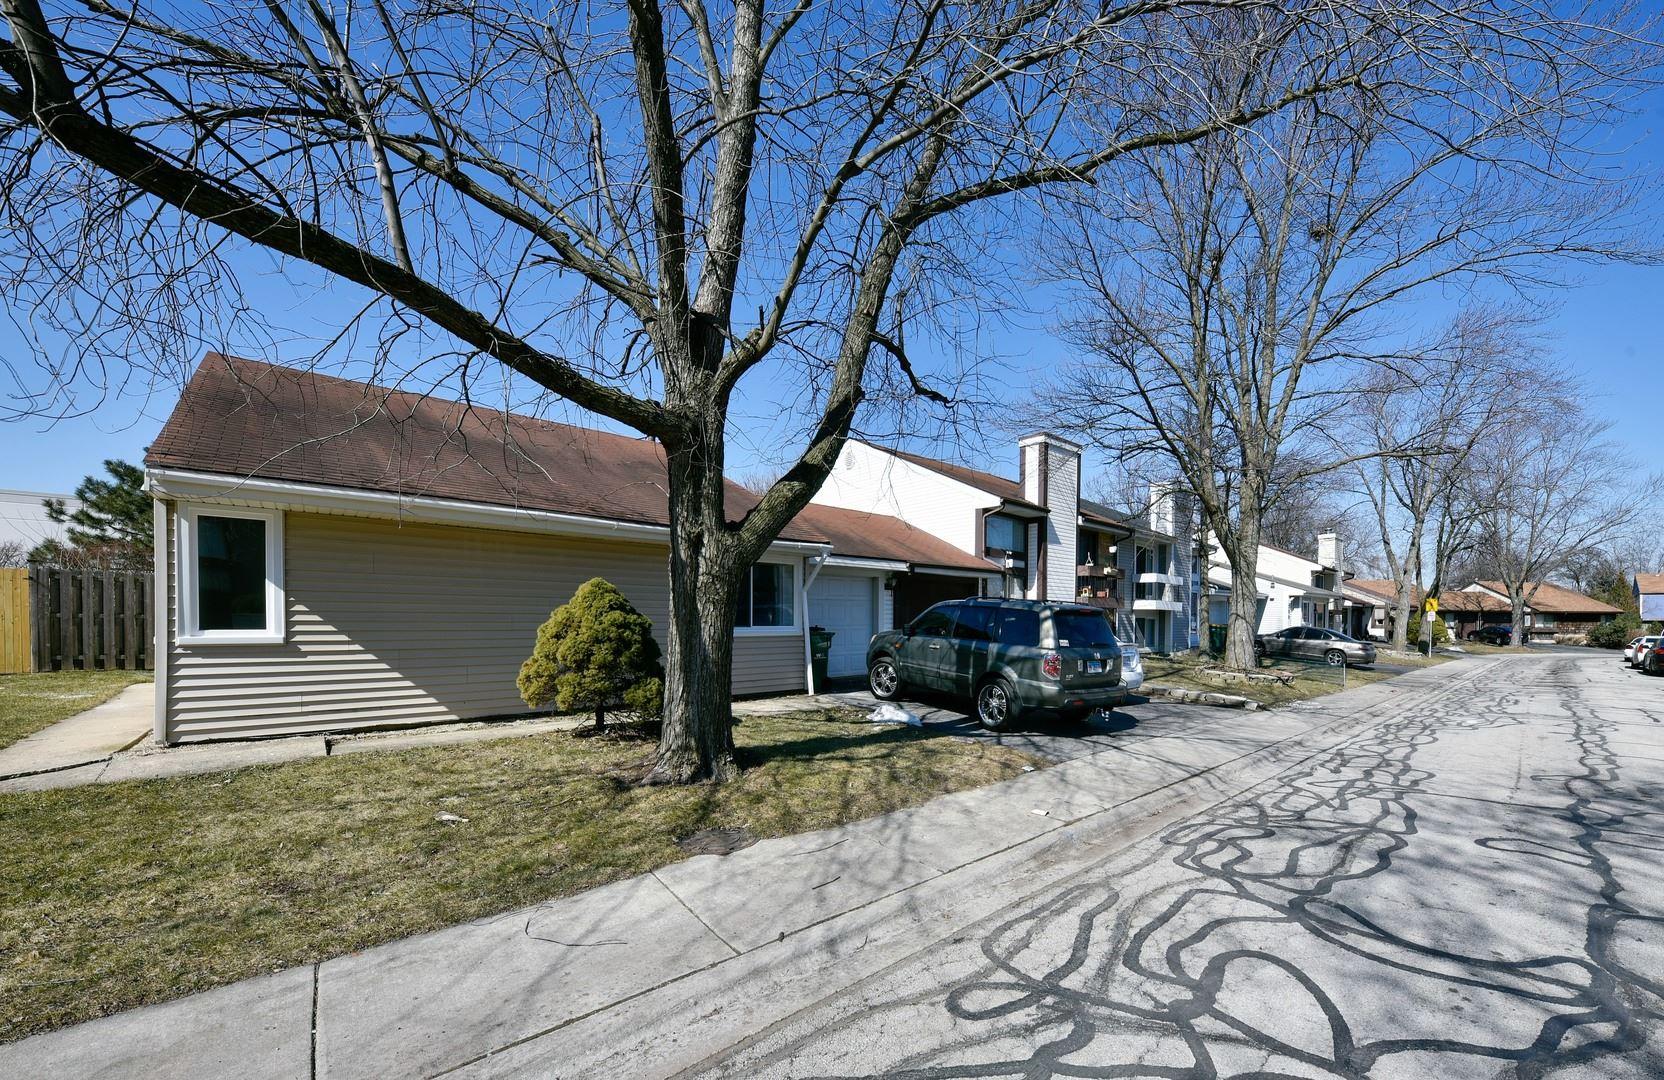 Photo of 202 Elmwood Road, Romeoville, IL 60446 (MLS # 11013194)